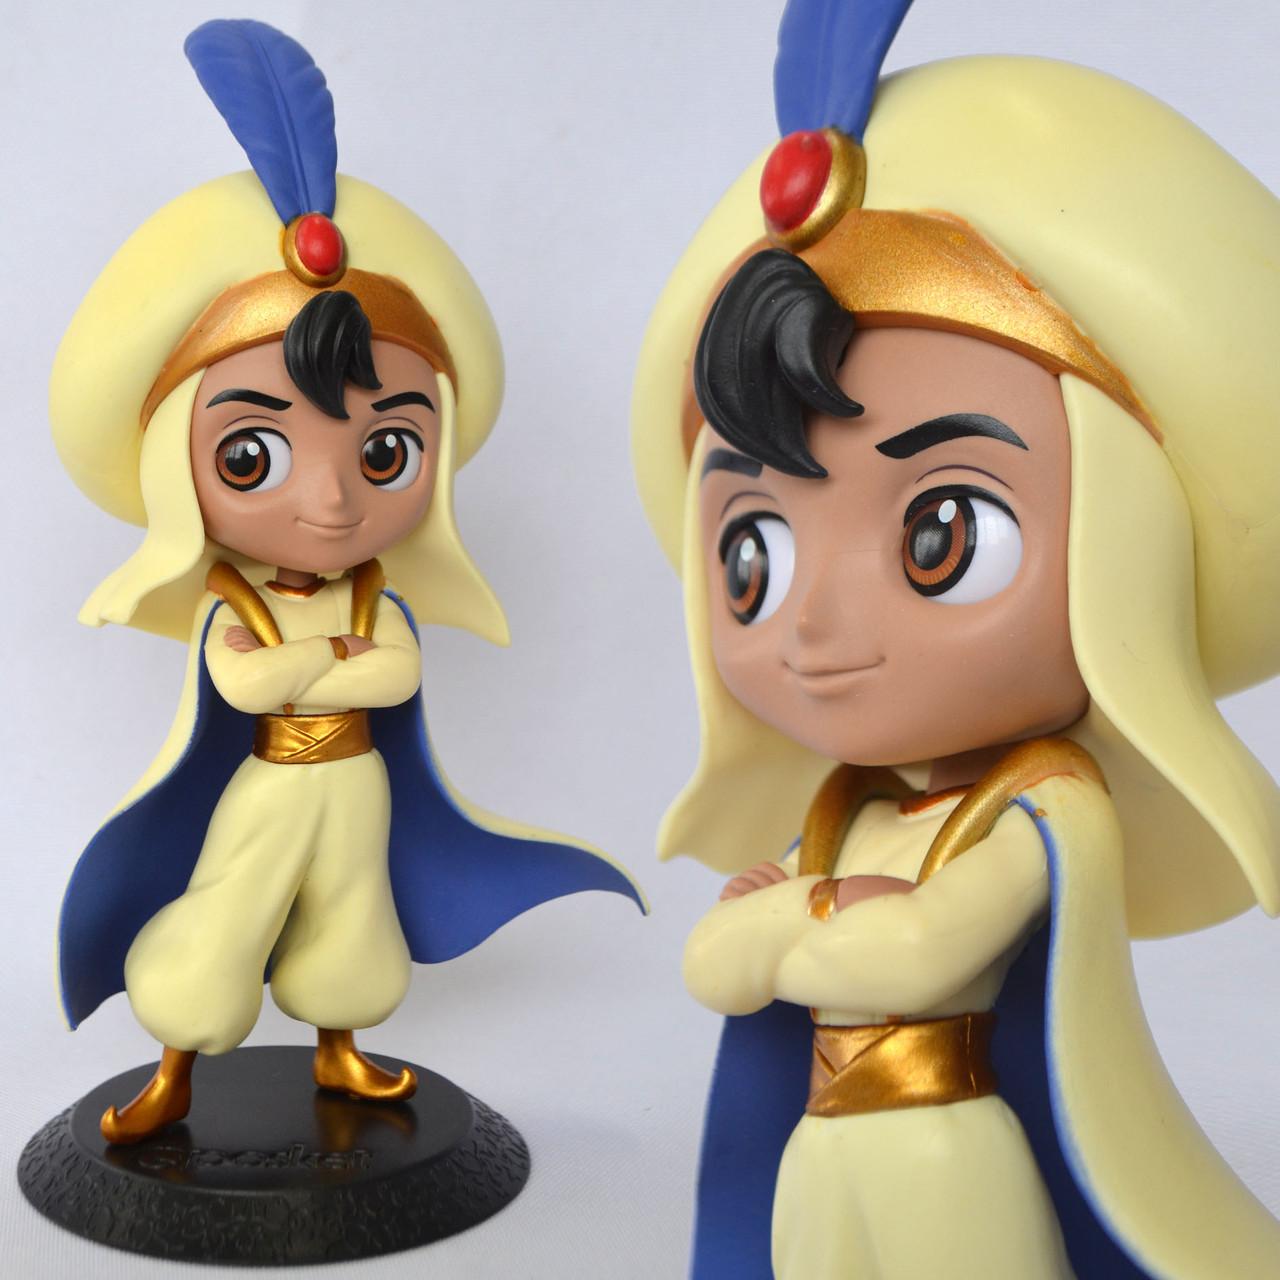 Фігурка Disney - Aladdin Prince St-A Qposket Banpresto